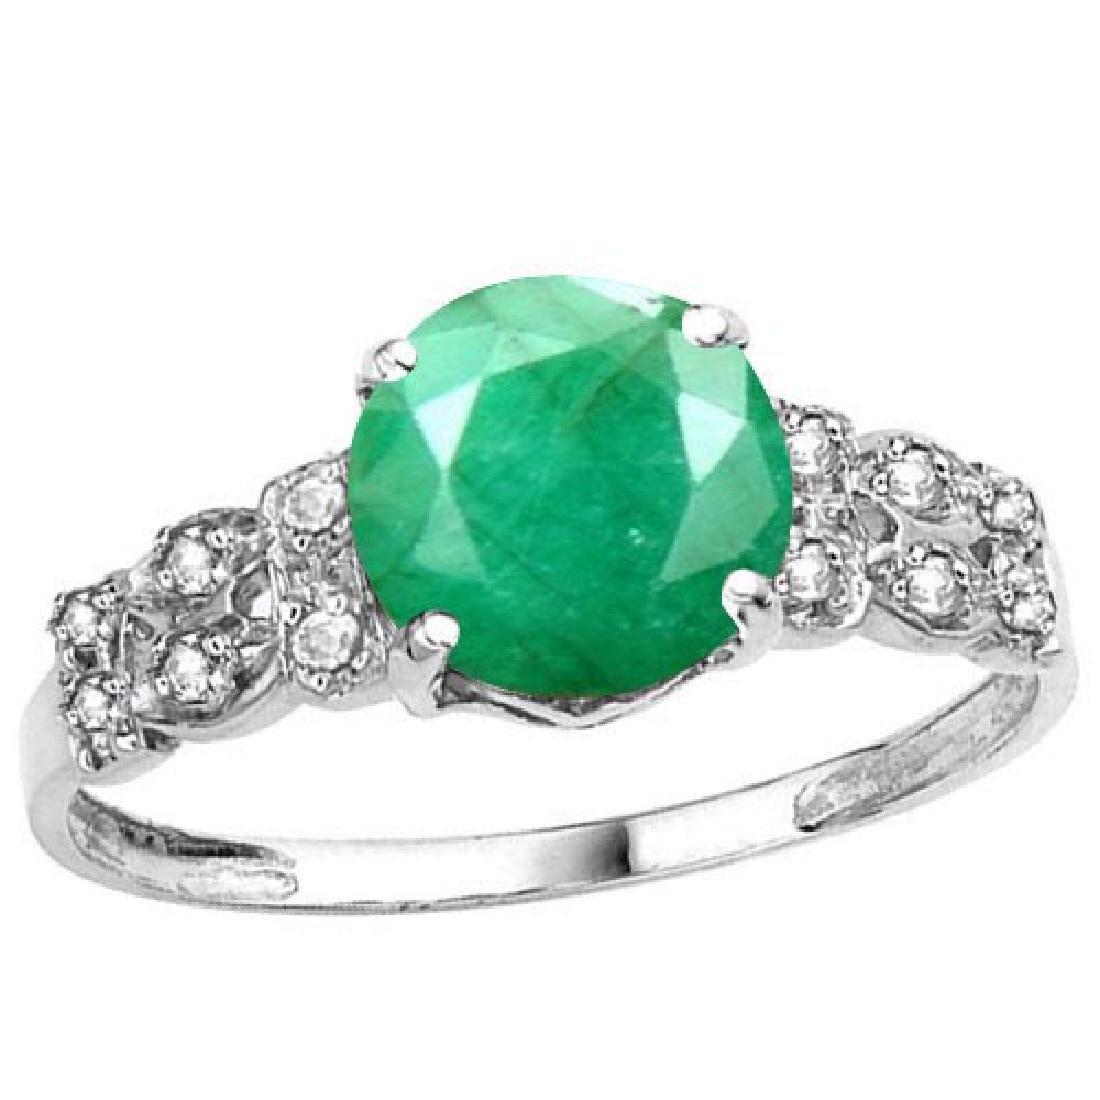 Certified 1.18 Ctw. Genuine Emerald And Diamond 14K Whi